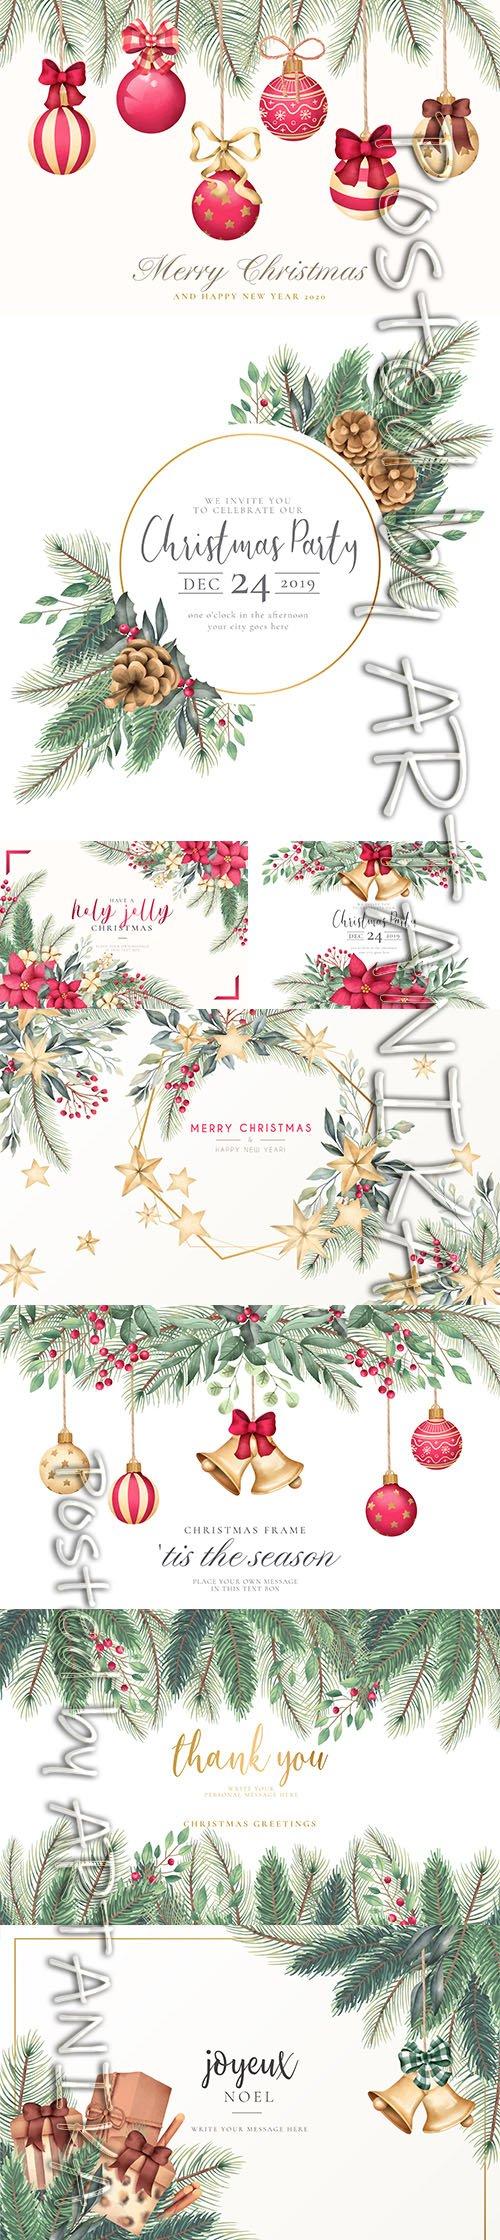 Elegant and Lovely Christmas Backgrounds Set Vol 3